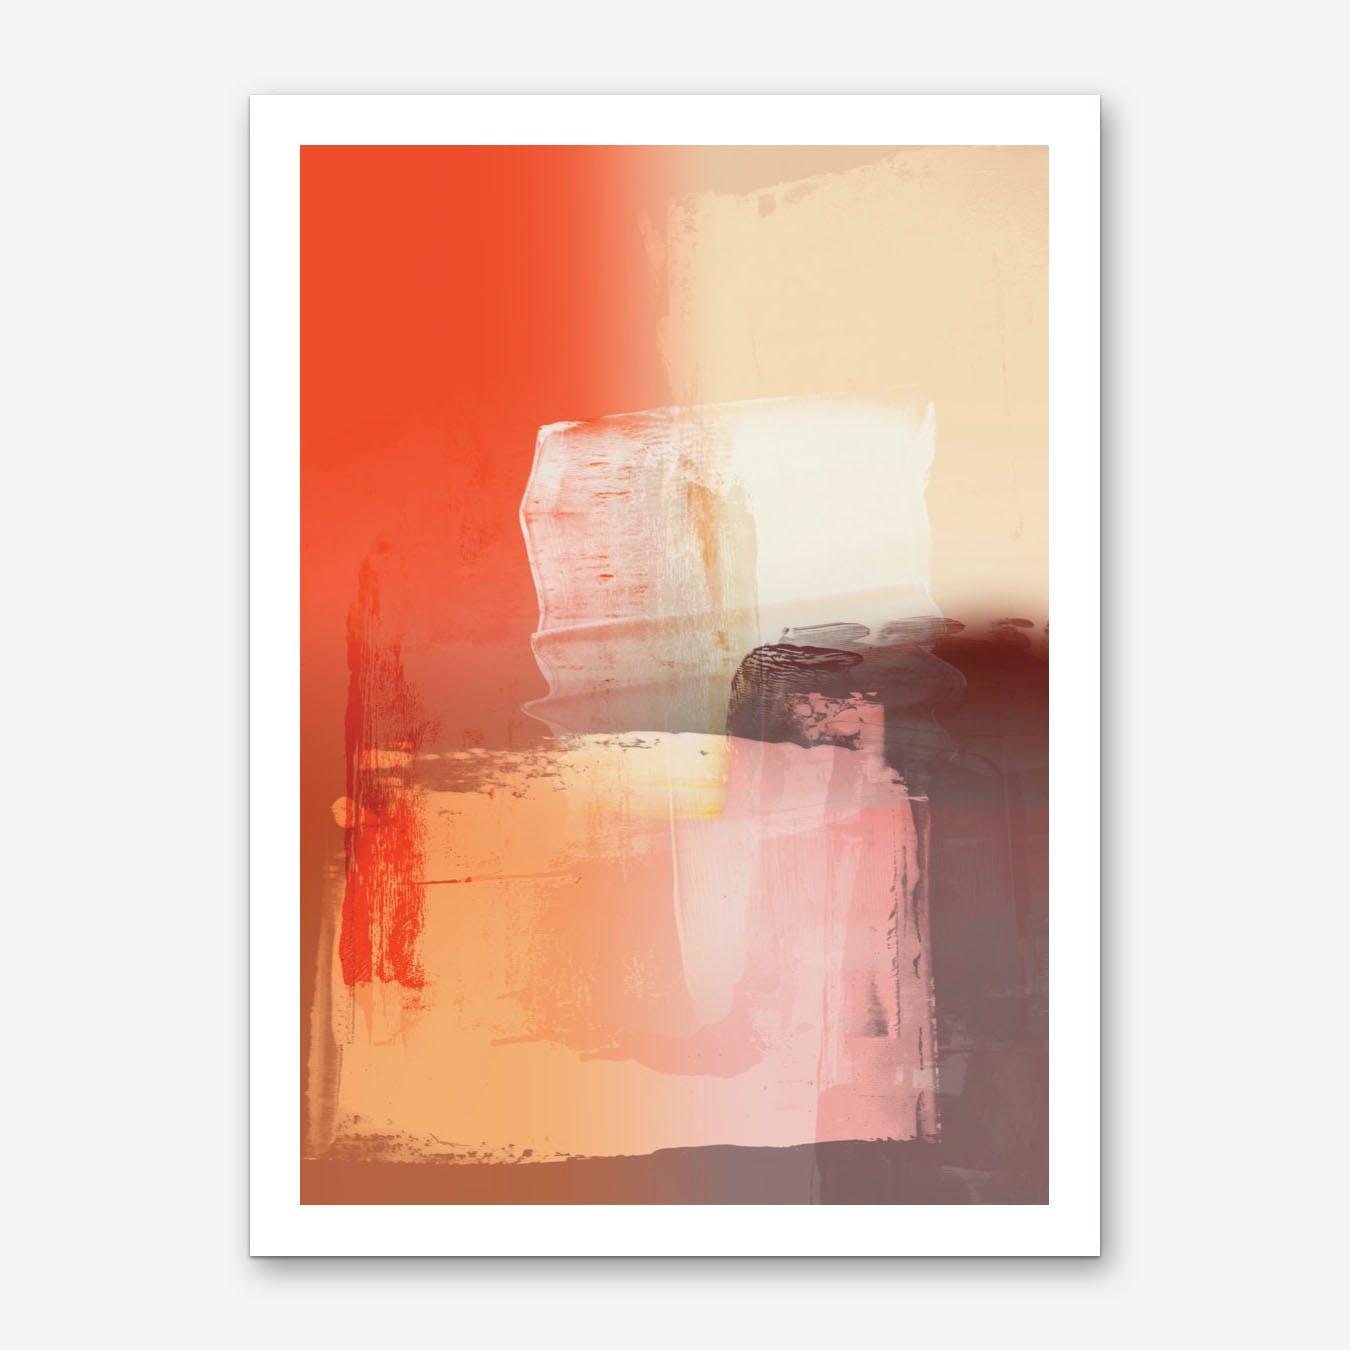 Abstract Brushmarks Orange Pinks Art Print